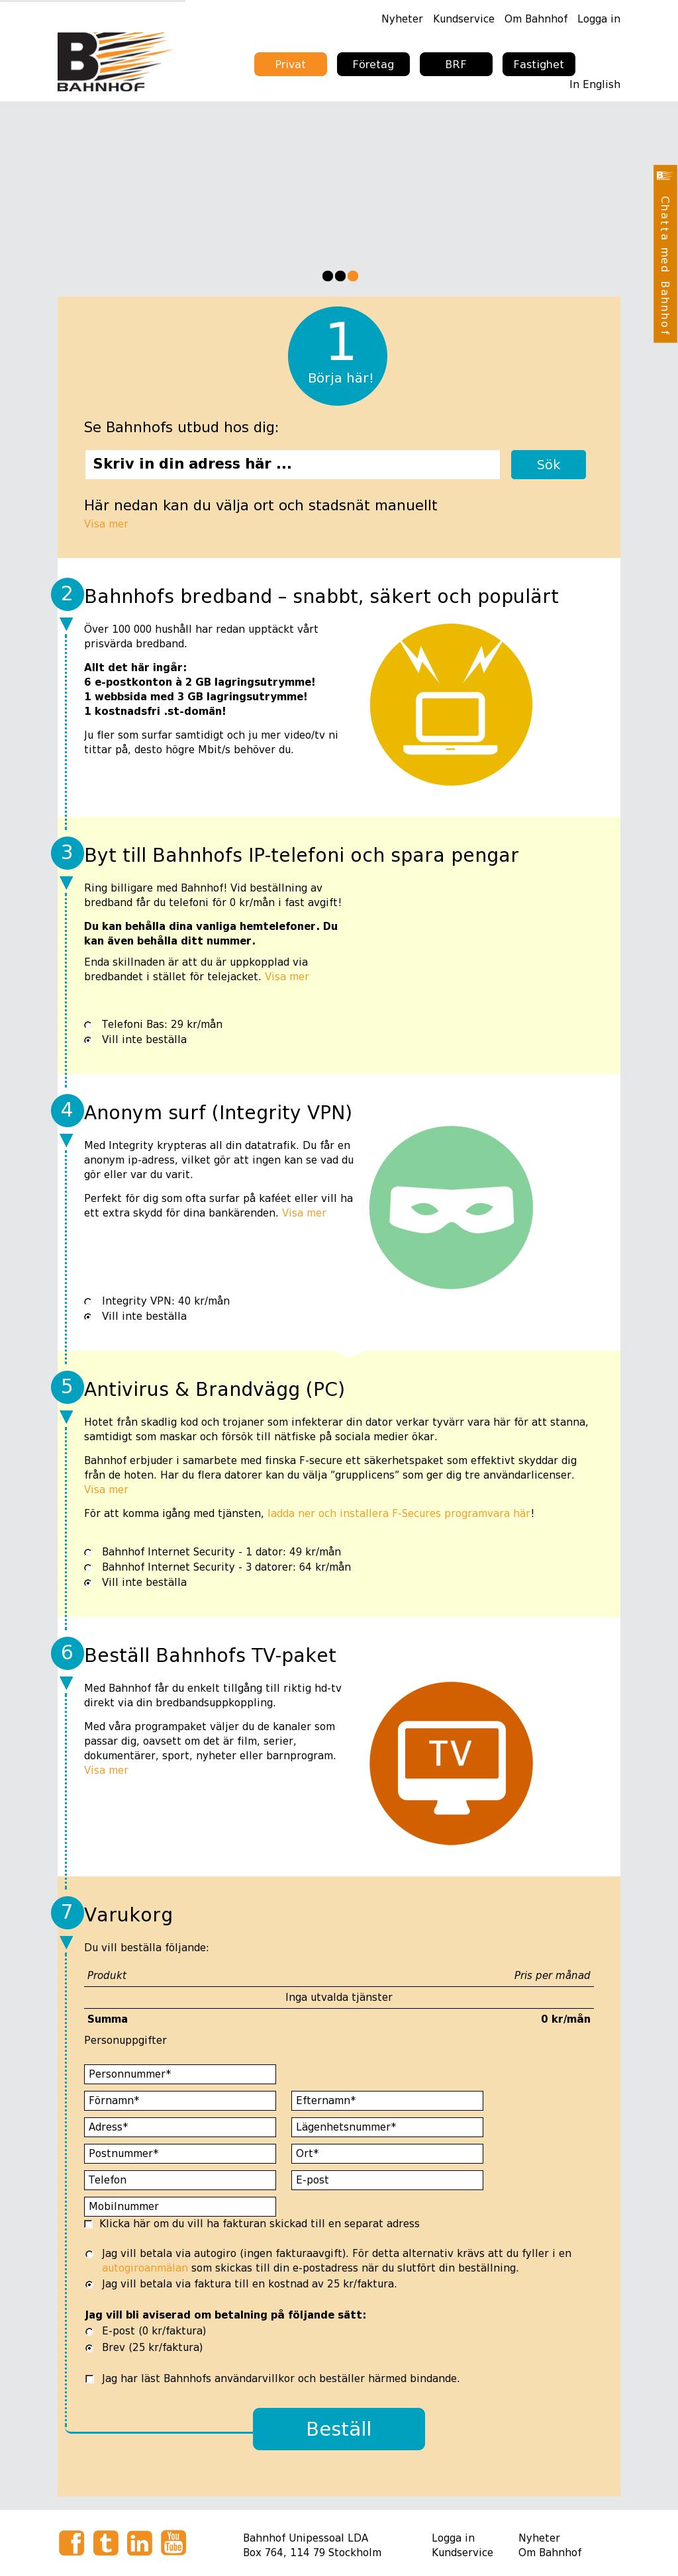 bahnhof internet security